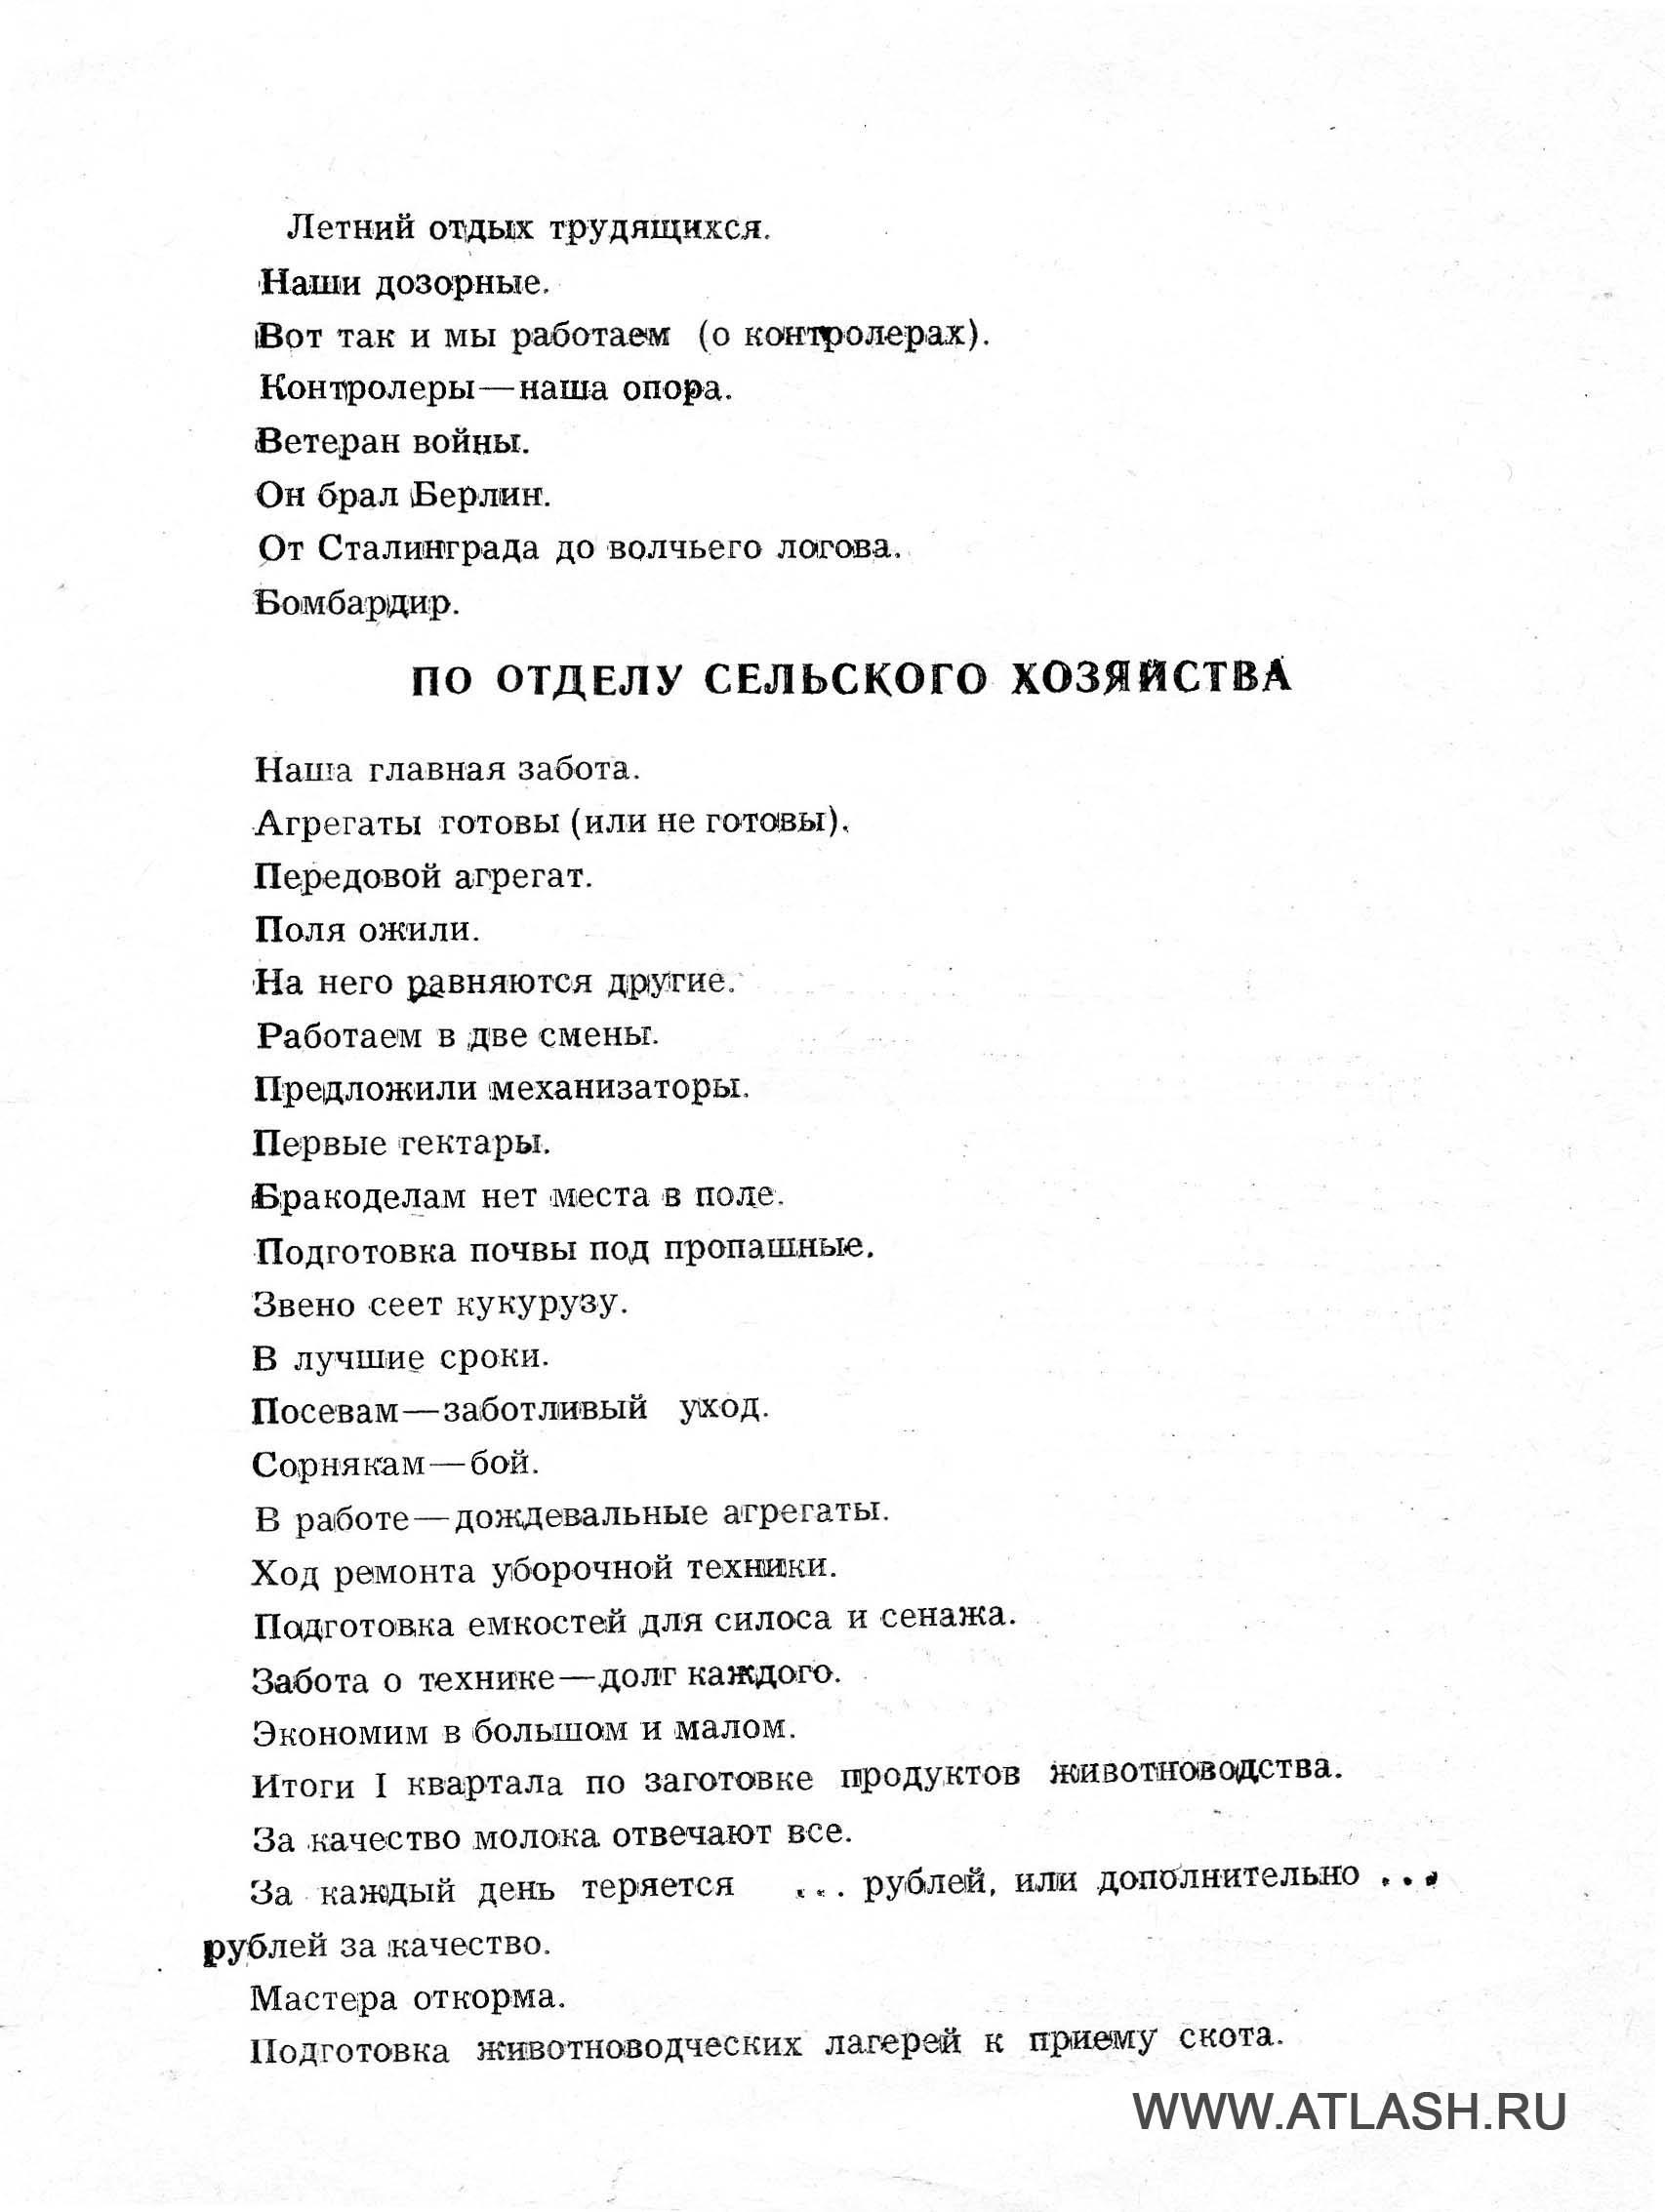 nahod_07_02